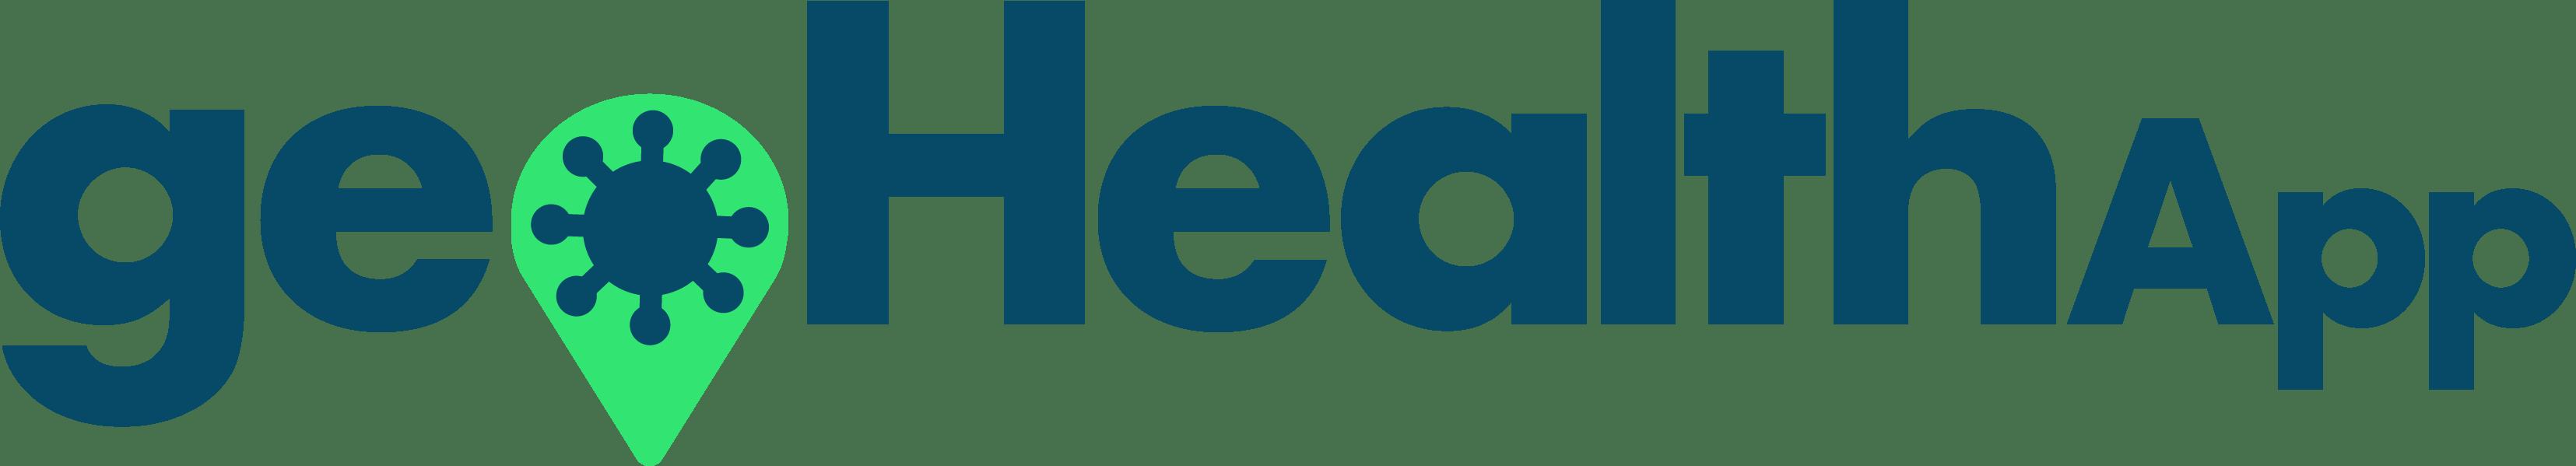 GeoHealthApp logo 1120